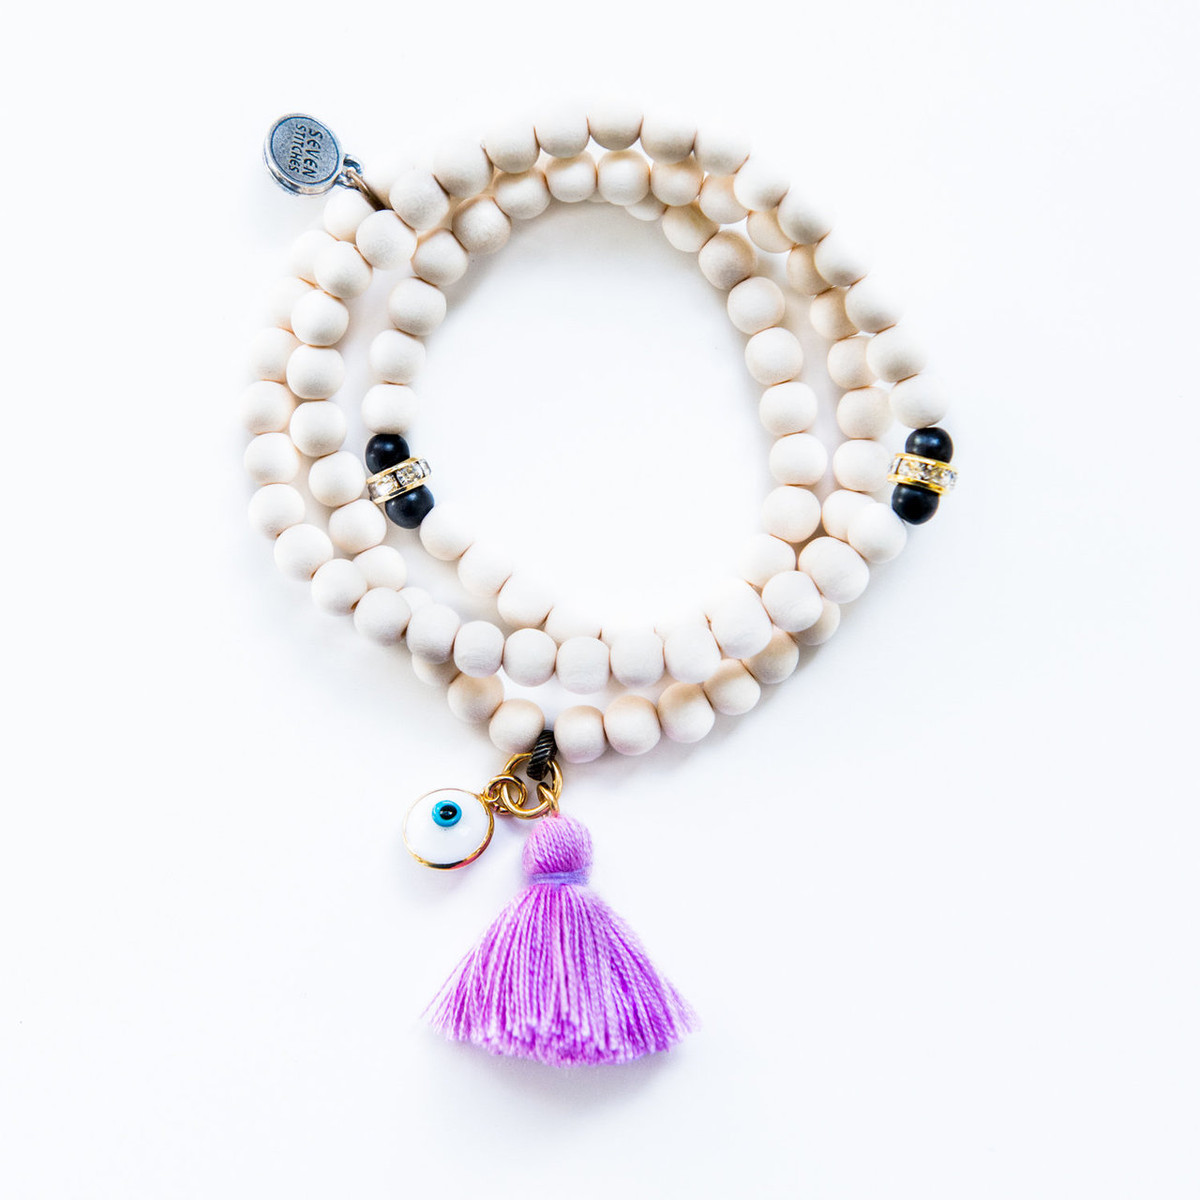 Triple Wrap White Wood Bracelet / Necklace Kabbalah Evil Eye Charm From 7Stitches